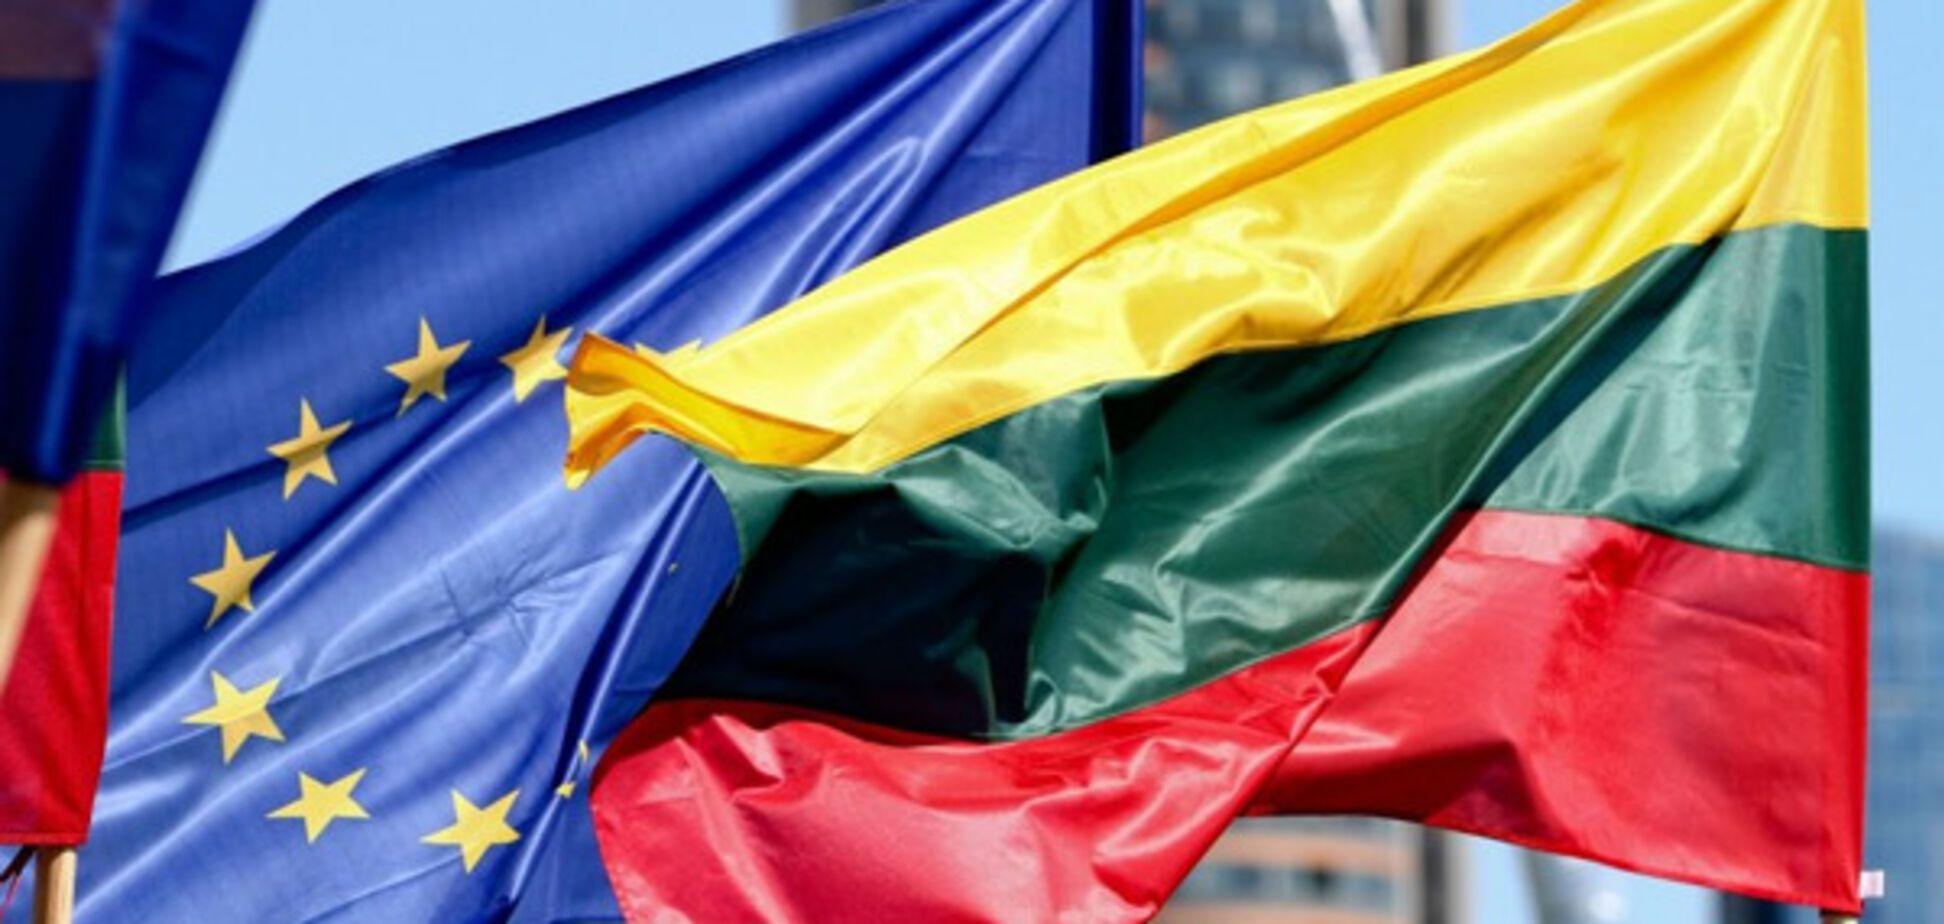 Флаги ЕС и Литвы